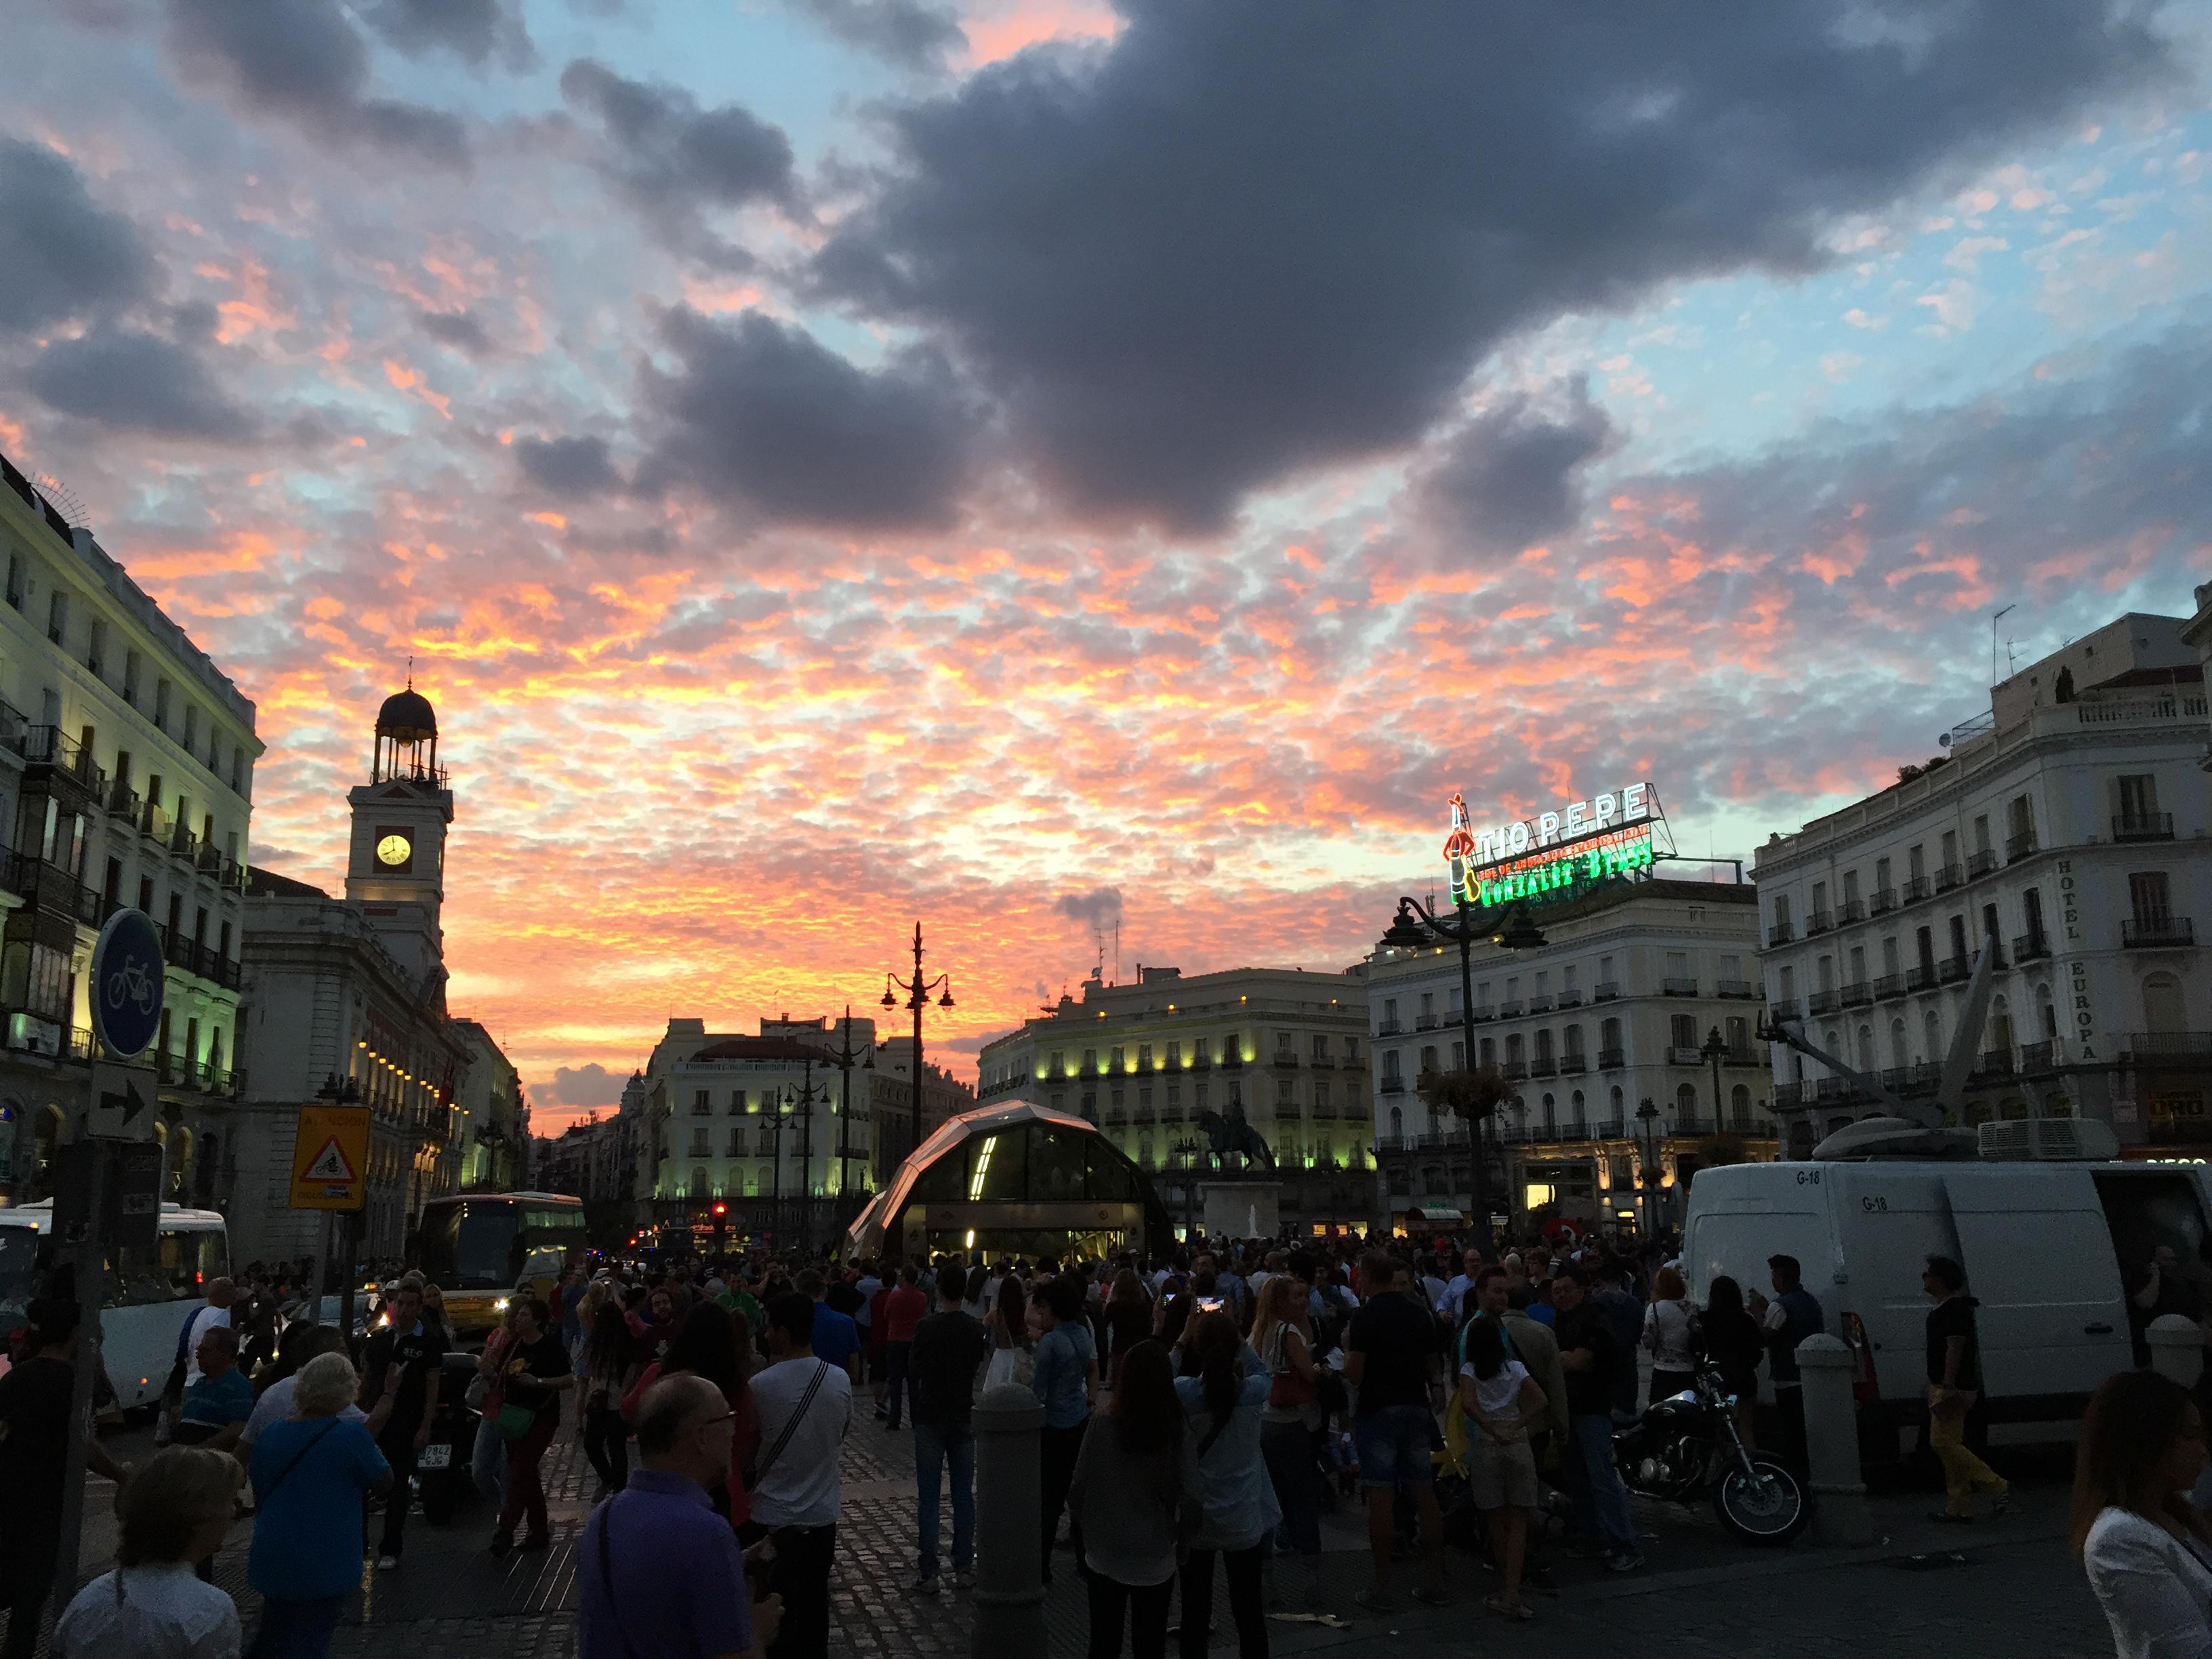 Proctor en Segovia students travel to Madrid